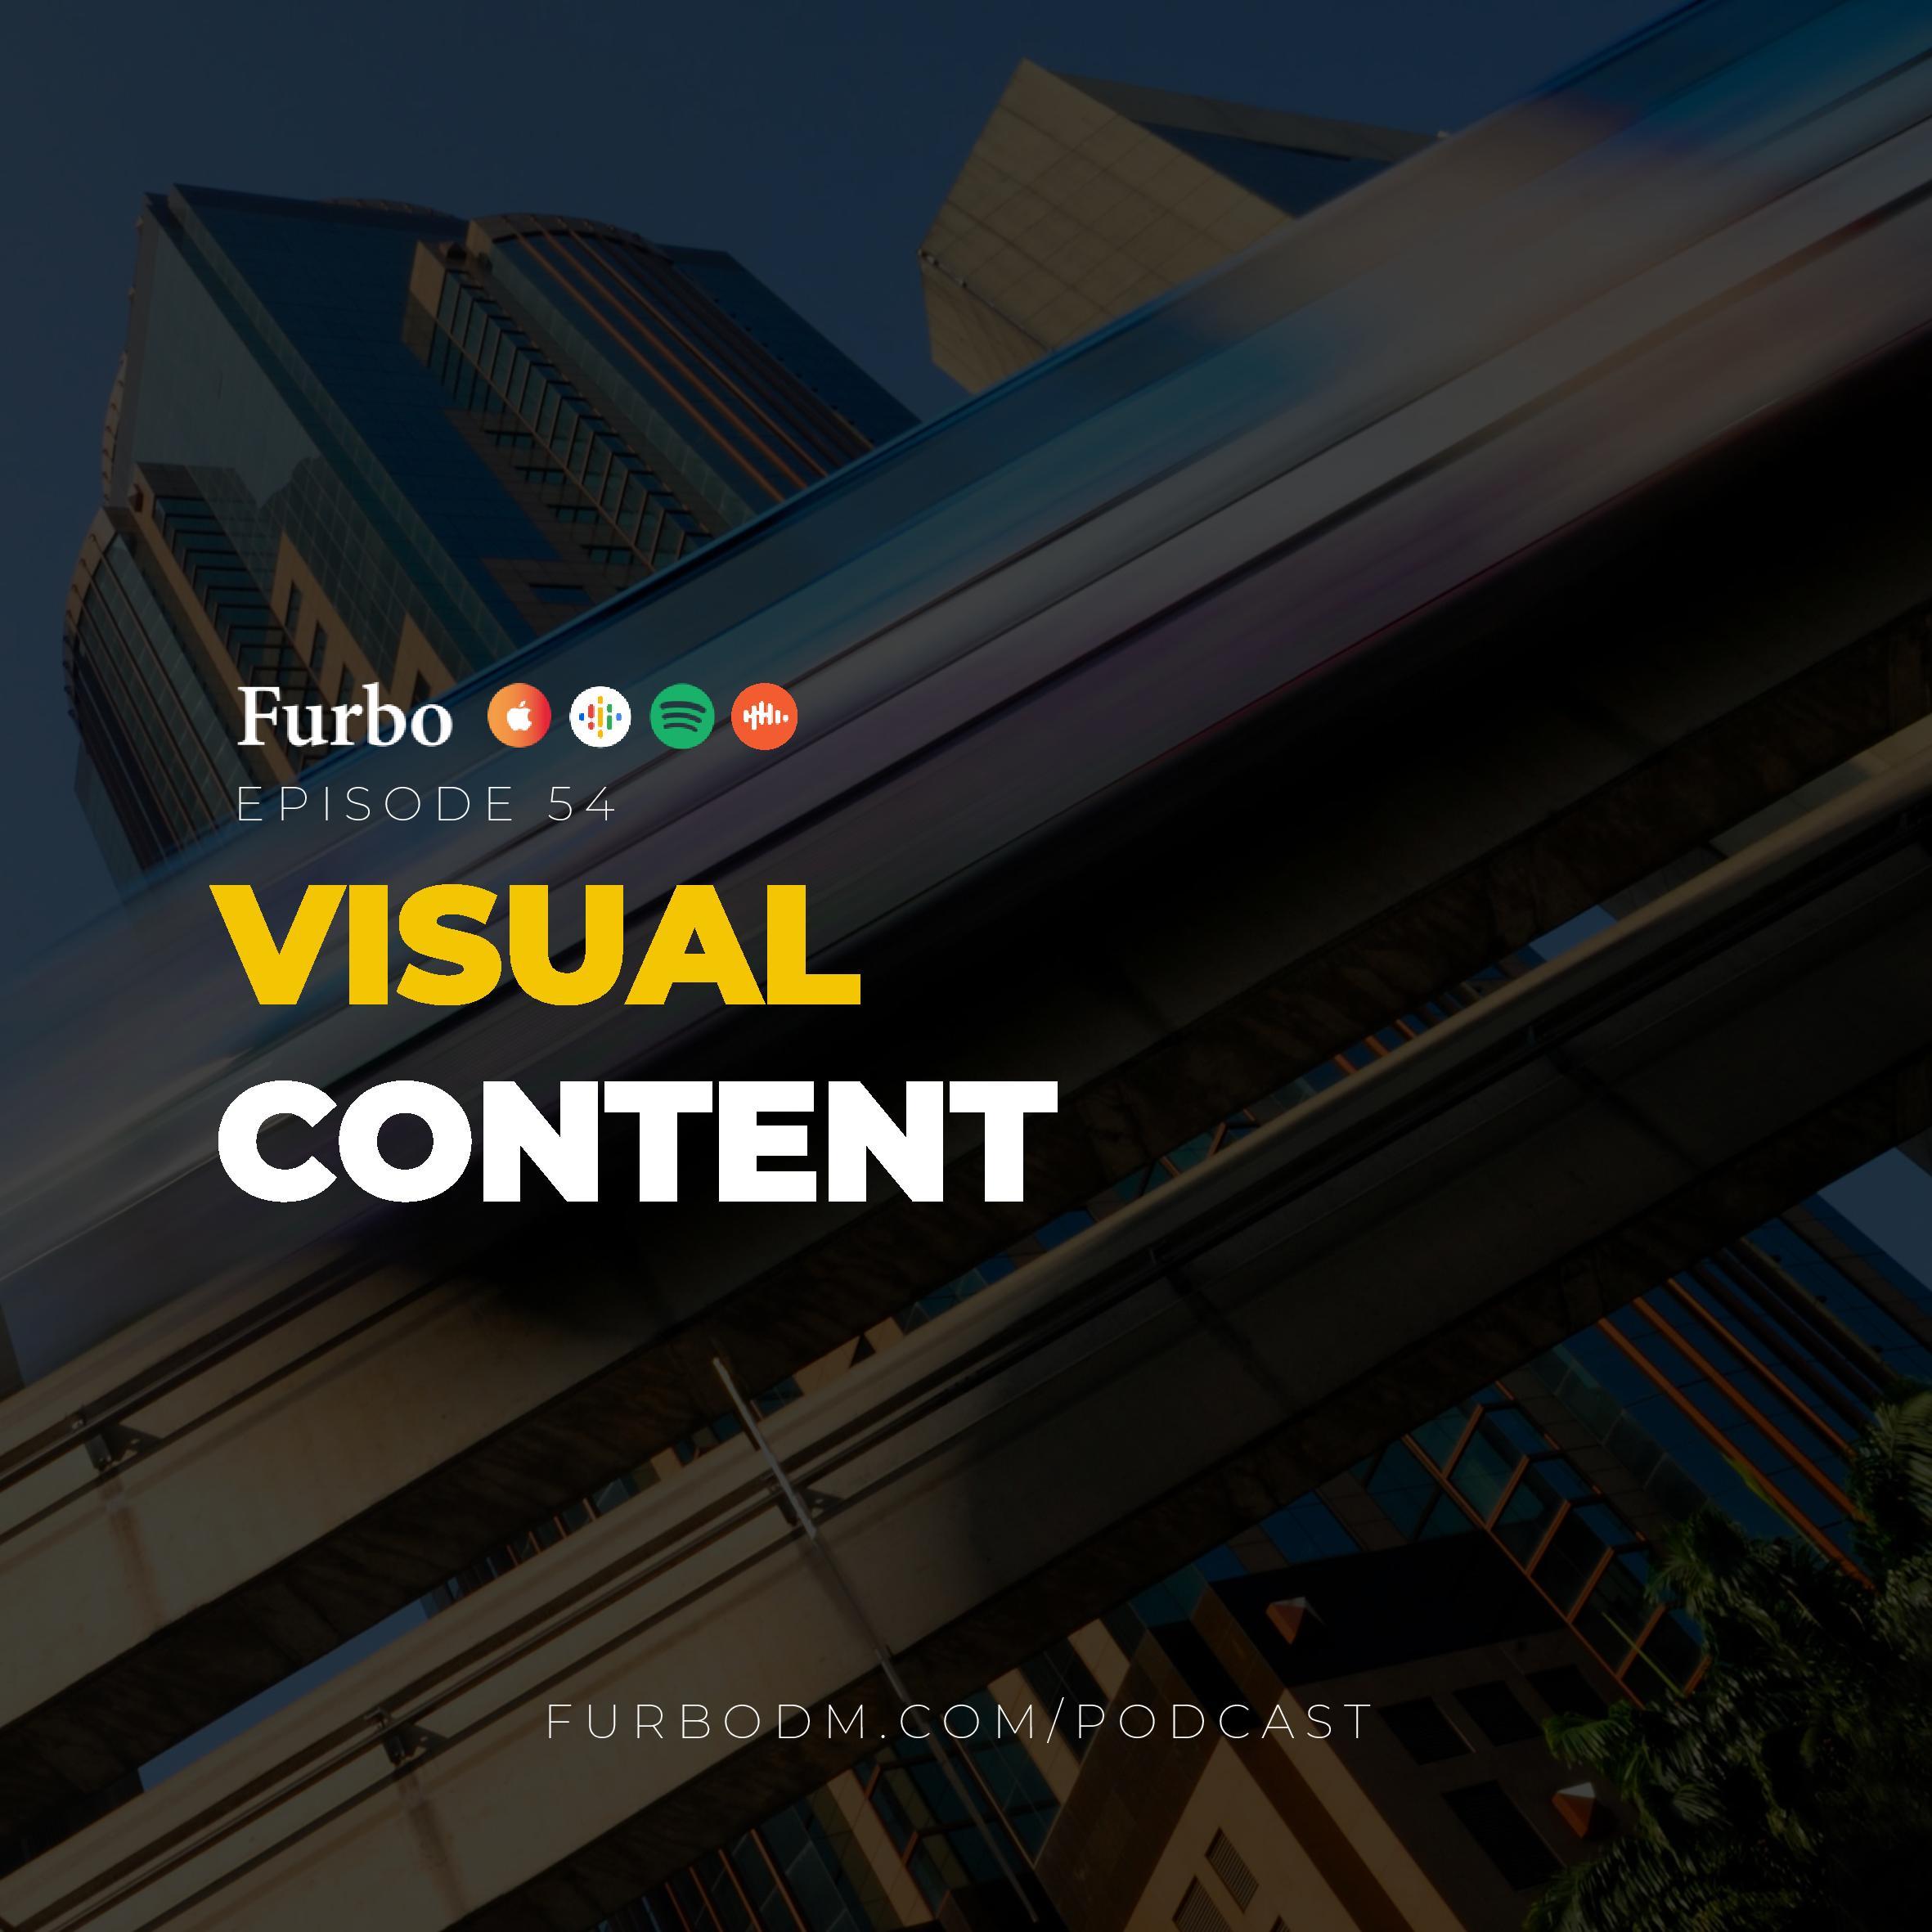 E54: Visual Content | تعریف محتوای تصویری و راهنمای تولید محتوا تصاویر گرافیکی برای اینستاگرام